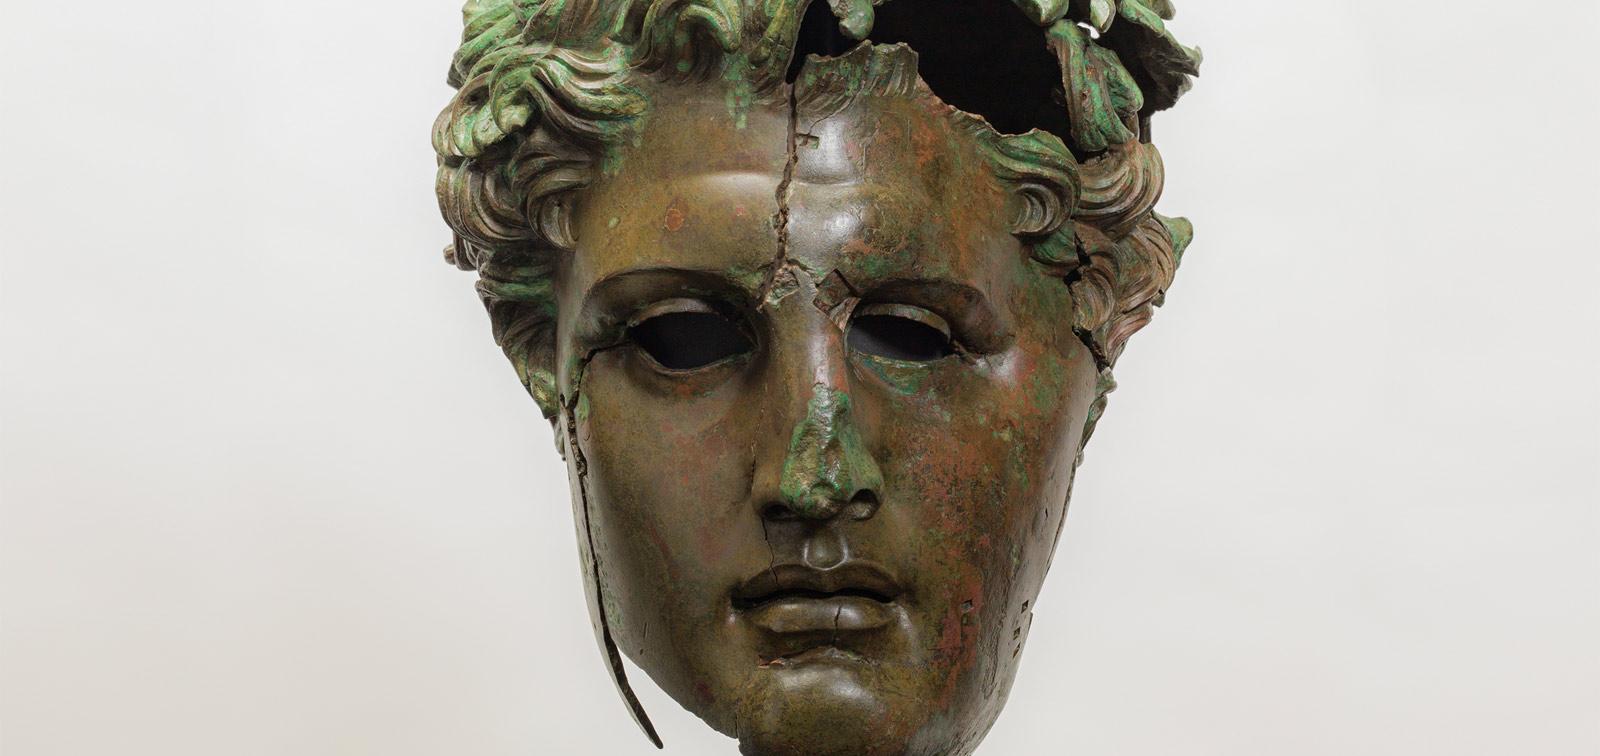 Demetrius Poliorcetes. A monumental hellenistic bronze restored